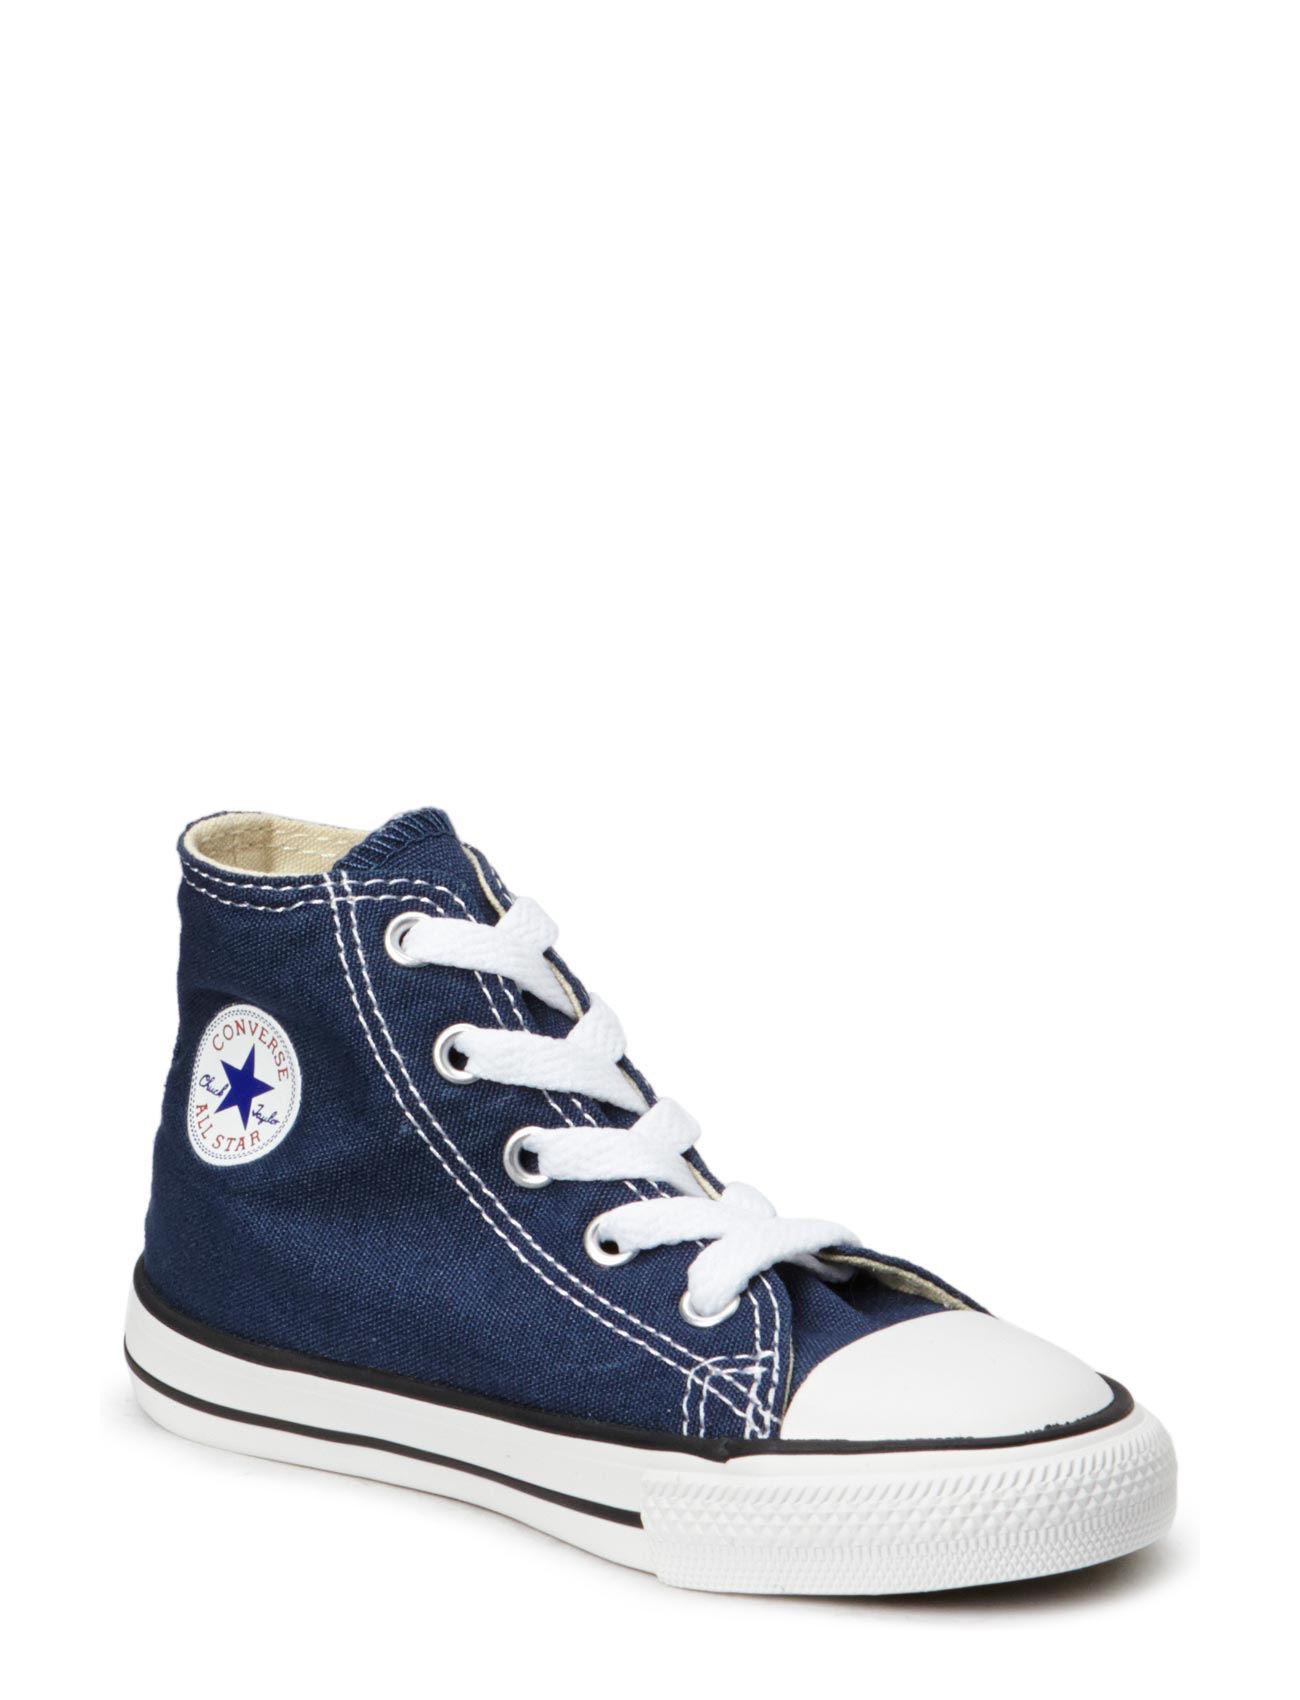 Small Star Canvas Hi Converse Sko & Sneakers til Børn i Navy blå